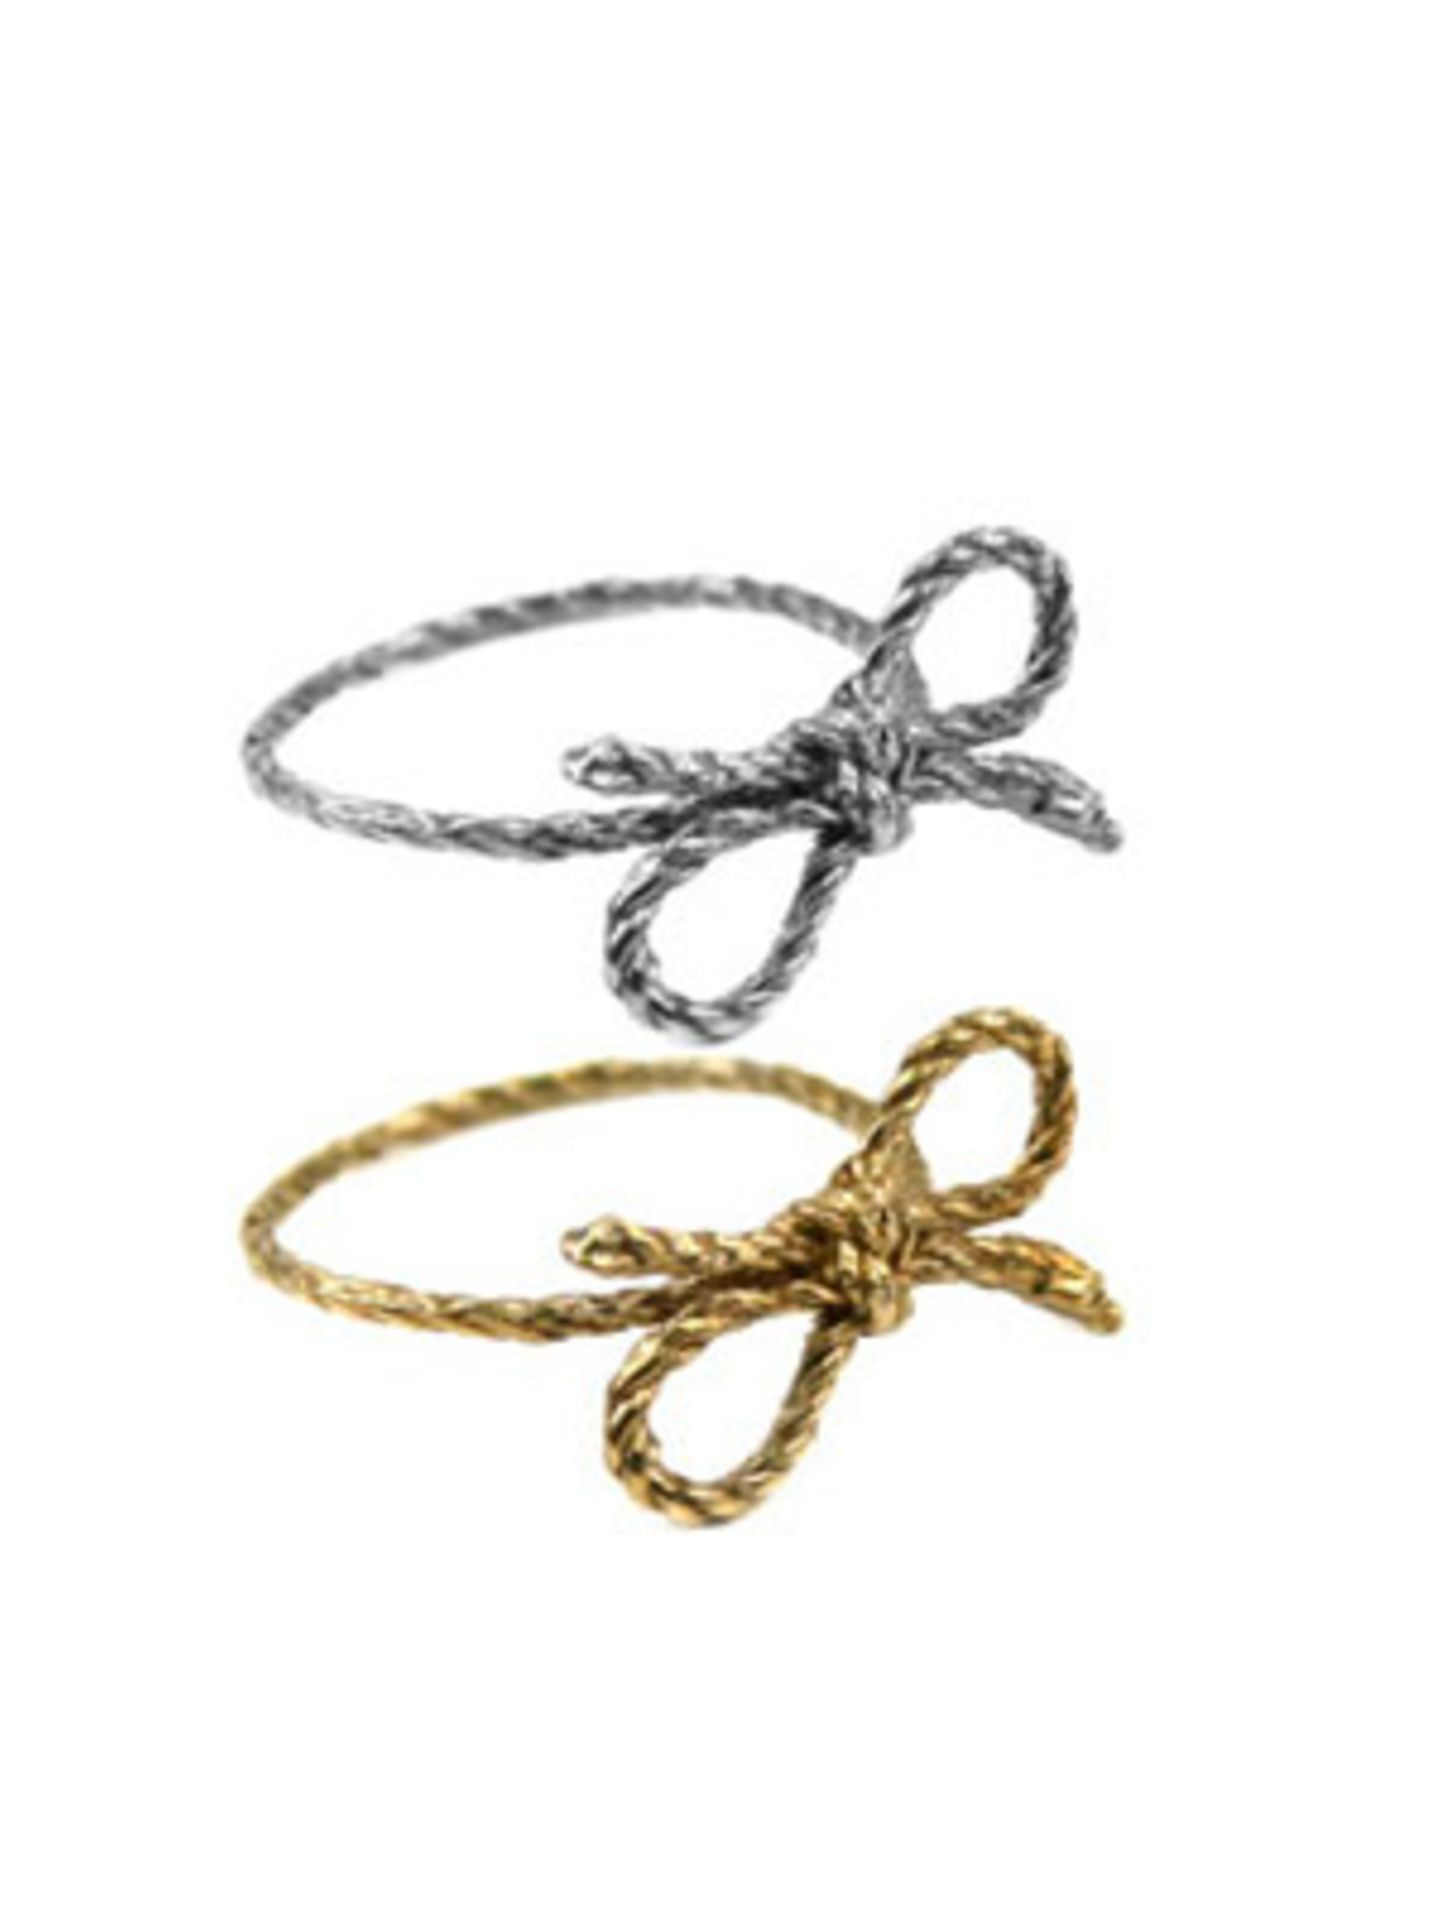 """Forget me Knot""-Ring in Silber oder Gold von www.fredflare.com, je um 50 Euro."